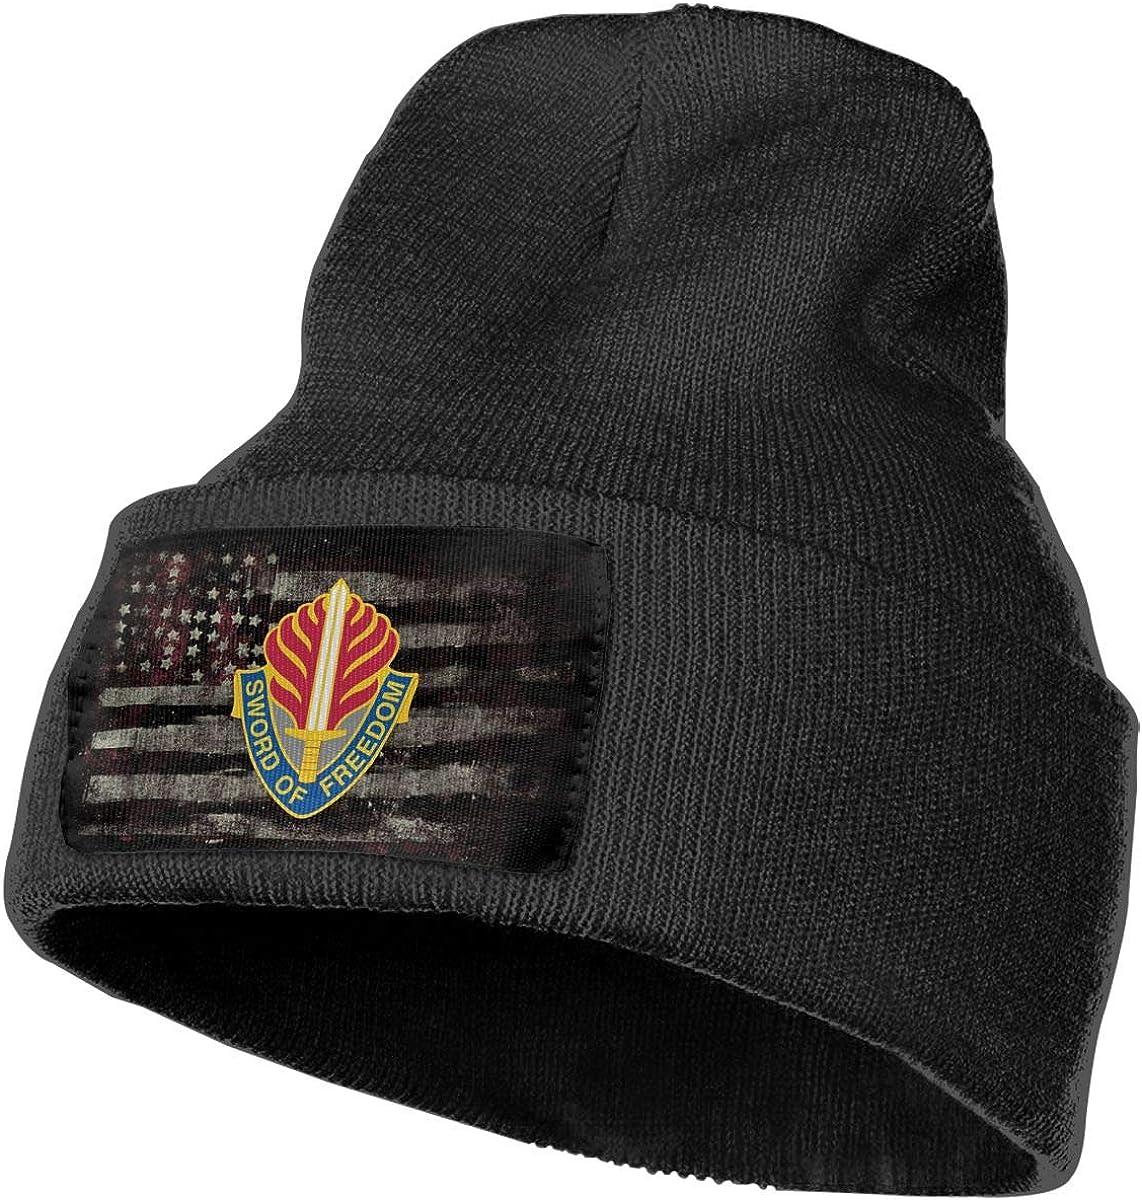 US Army Europe Command Unit Crest Mens Beanie Cap Skull Cap Winter Warm Knitting Hats.